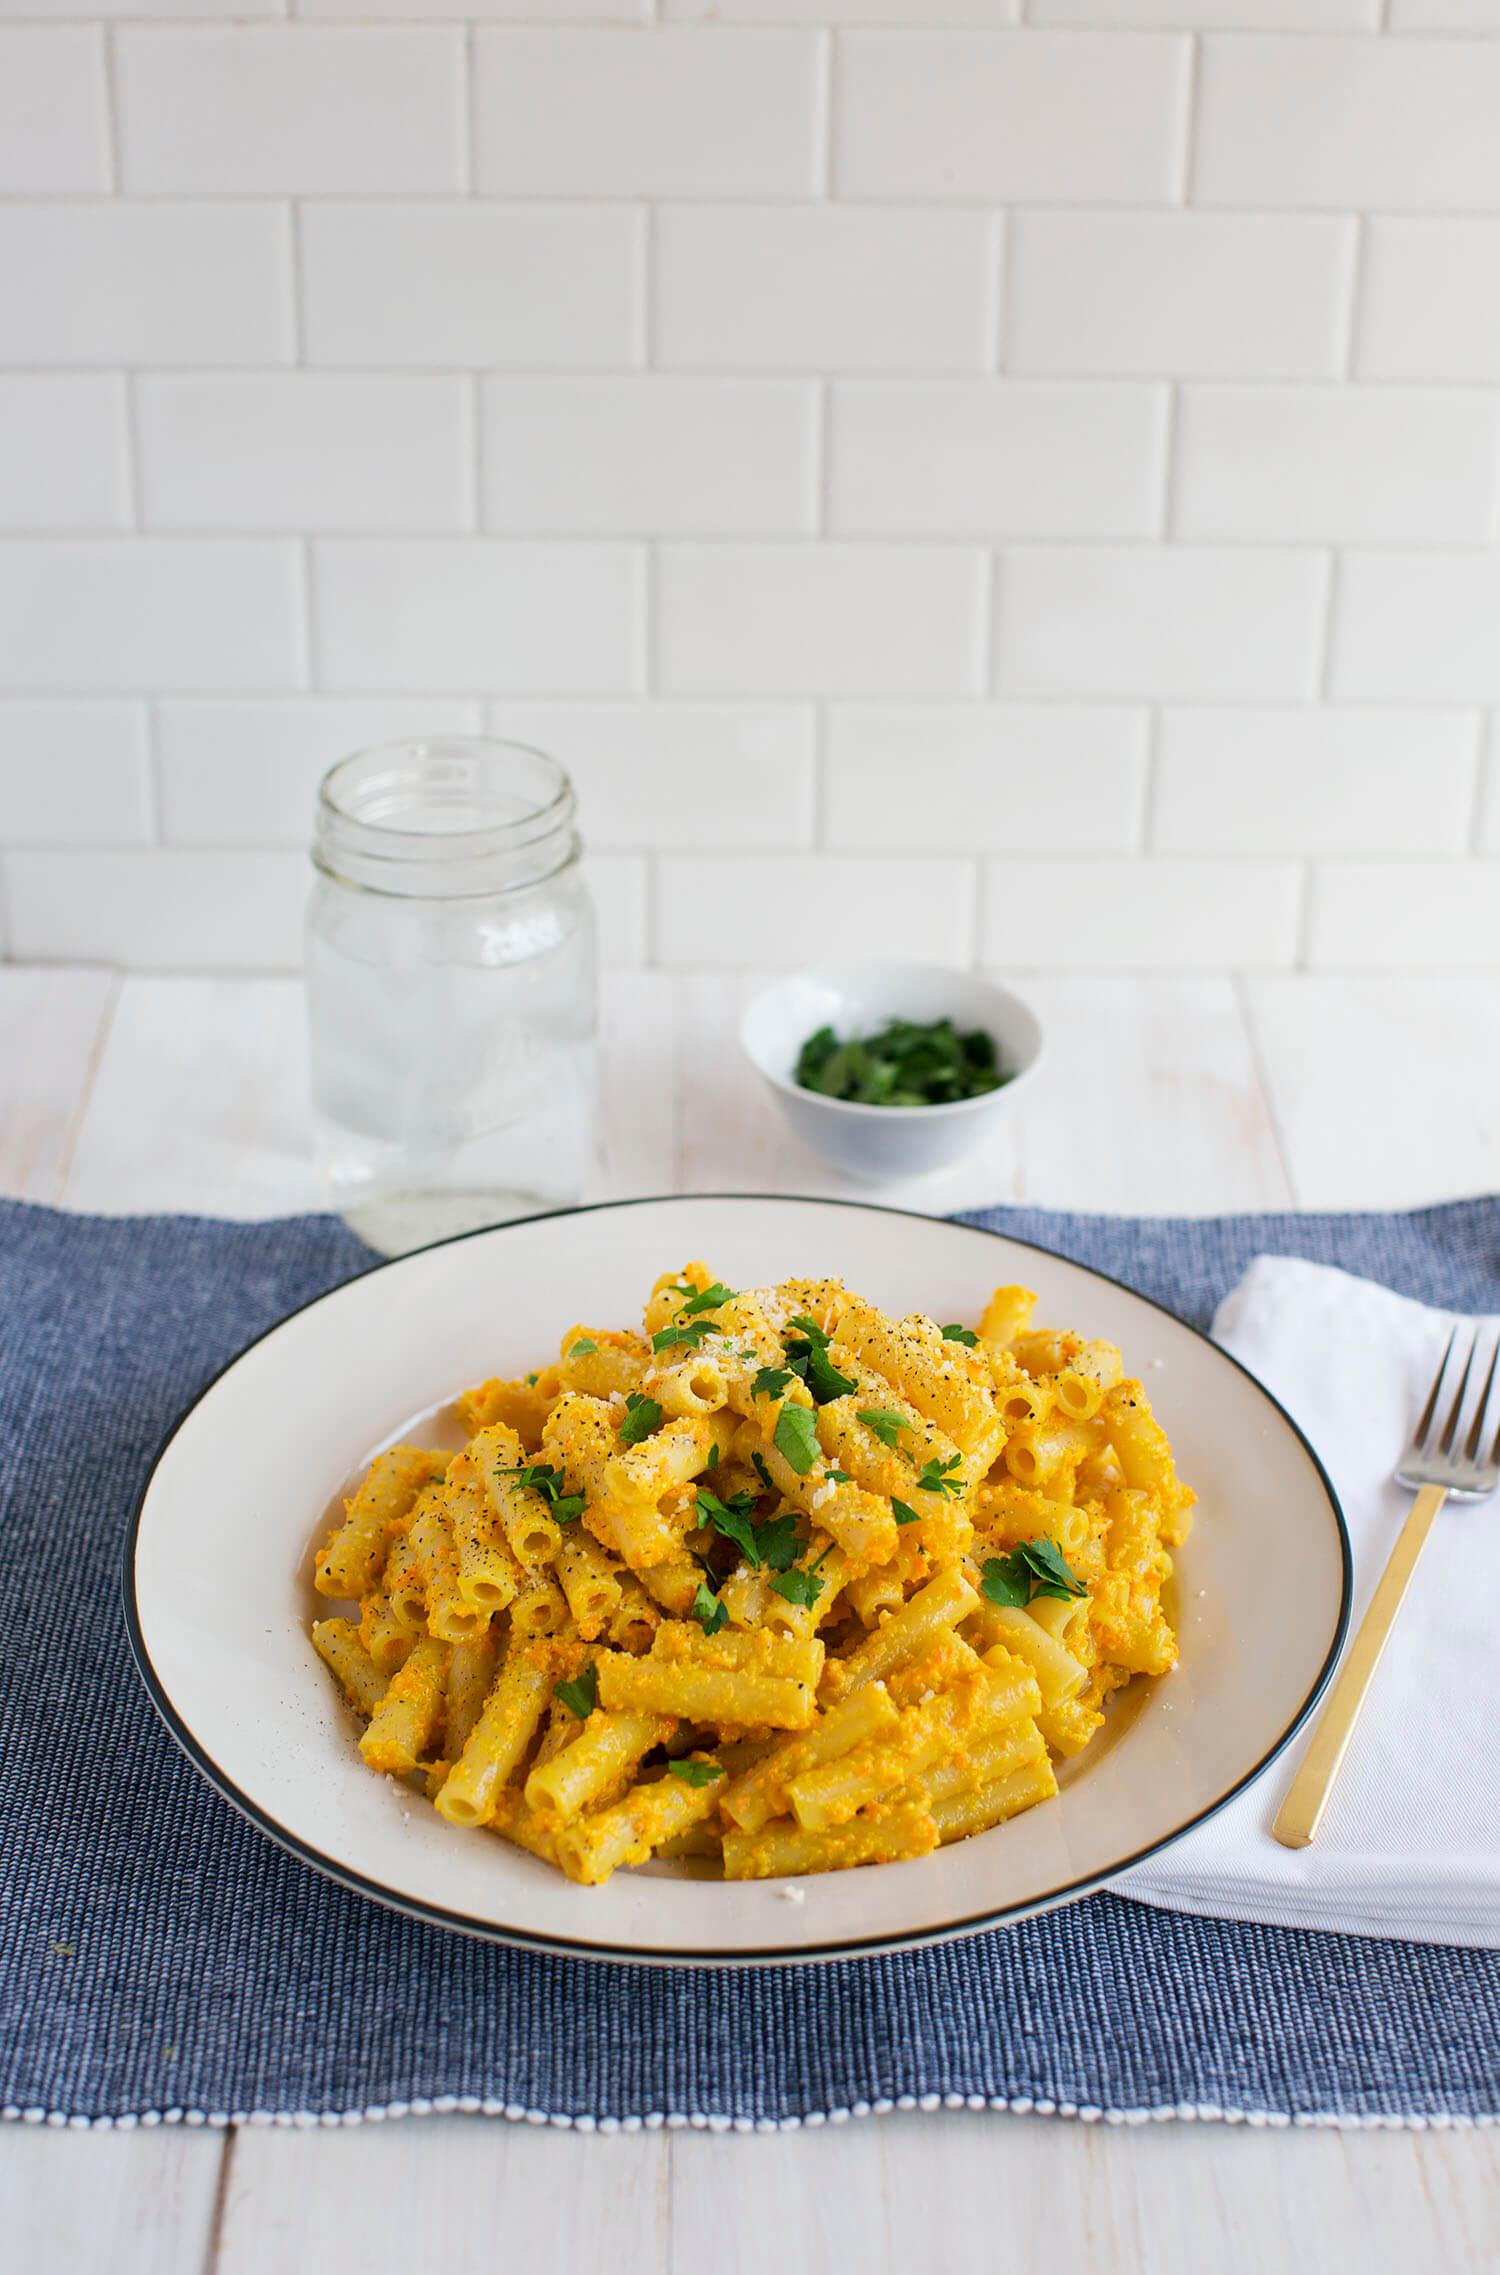 Carrot Pesto Pasta (via abeautifulmess.com)